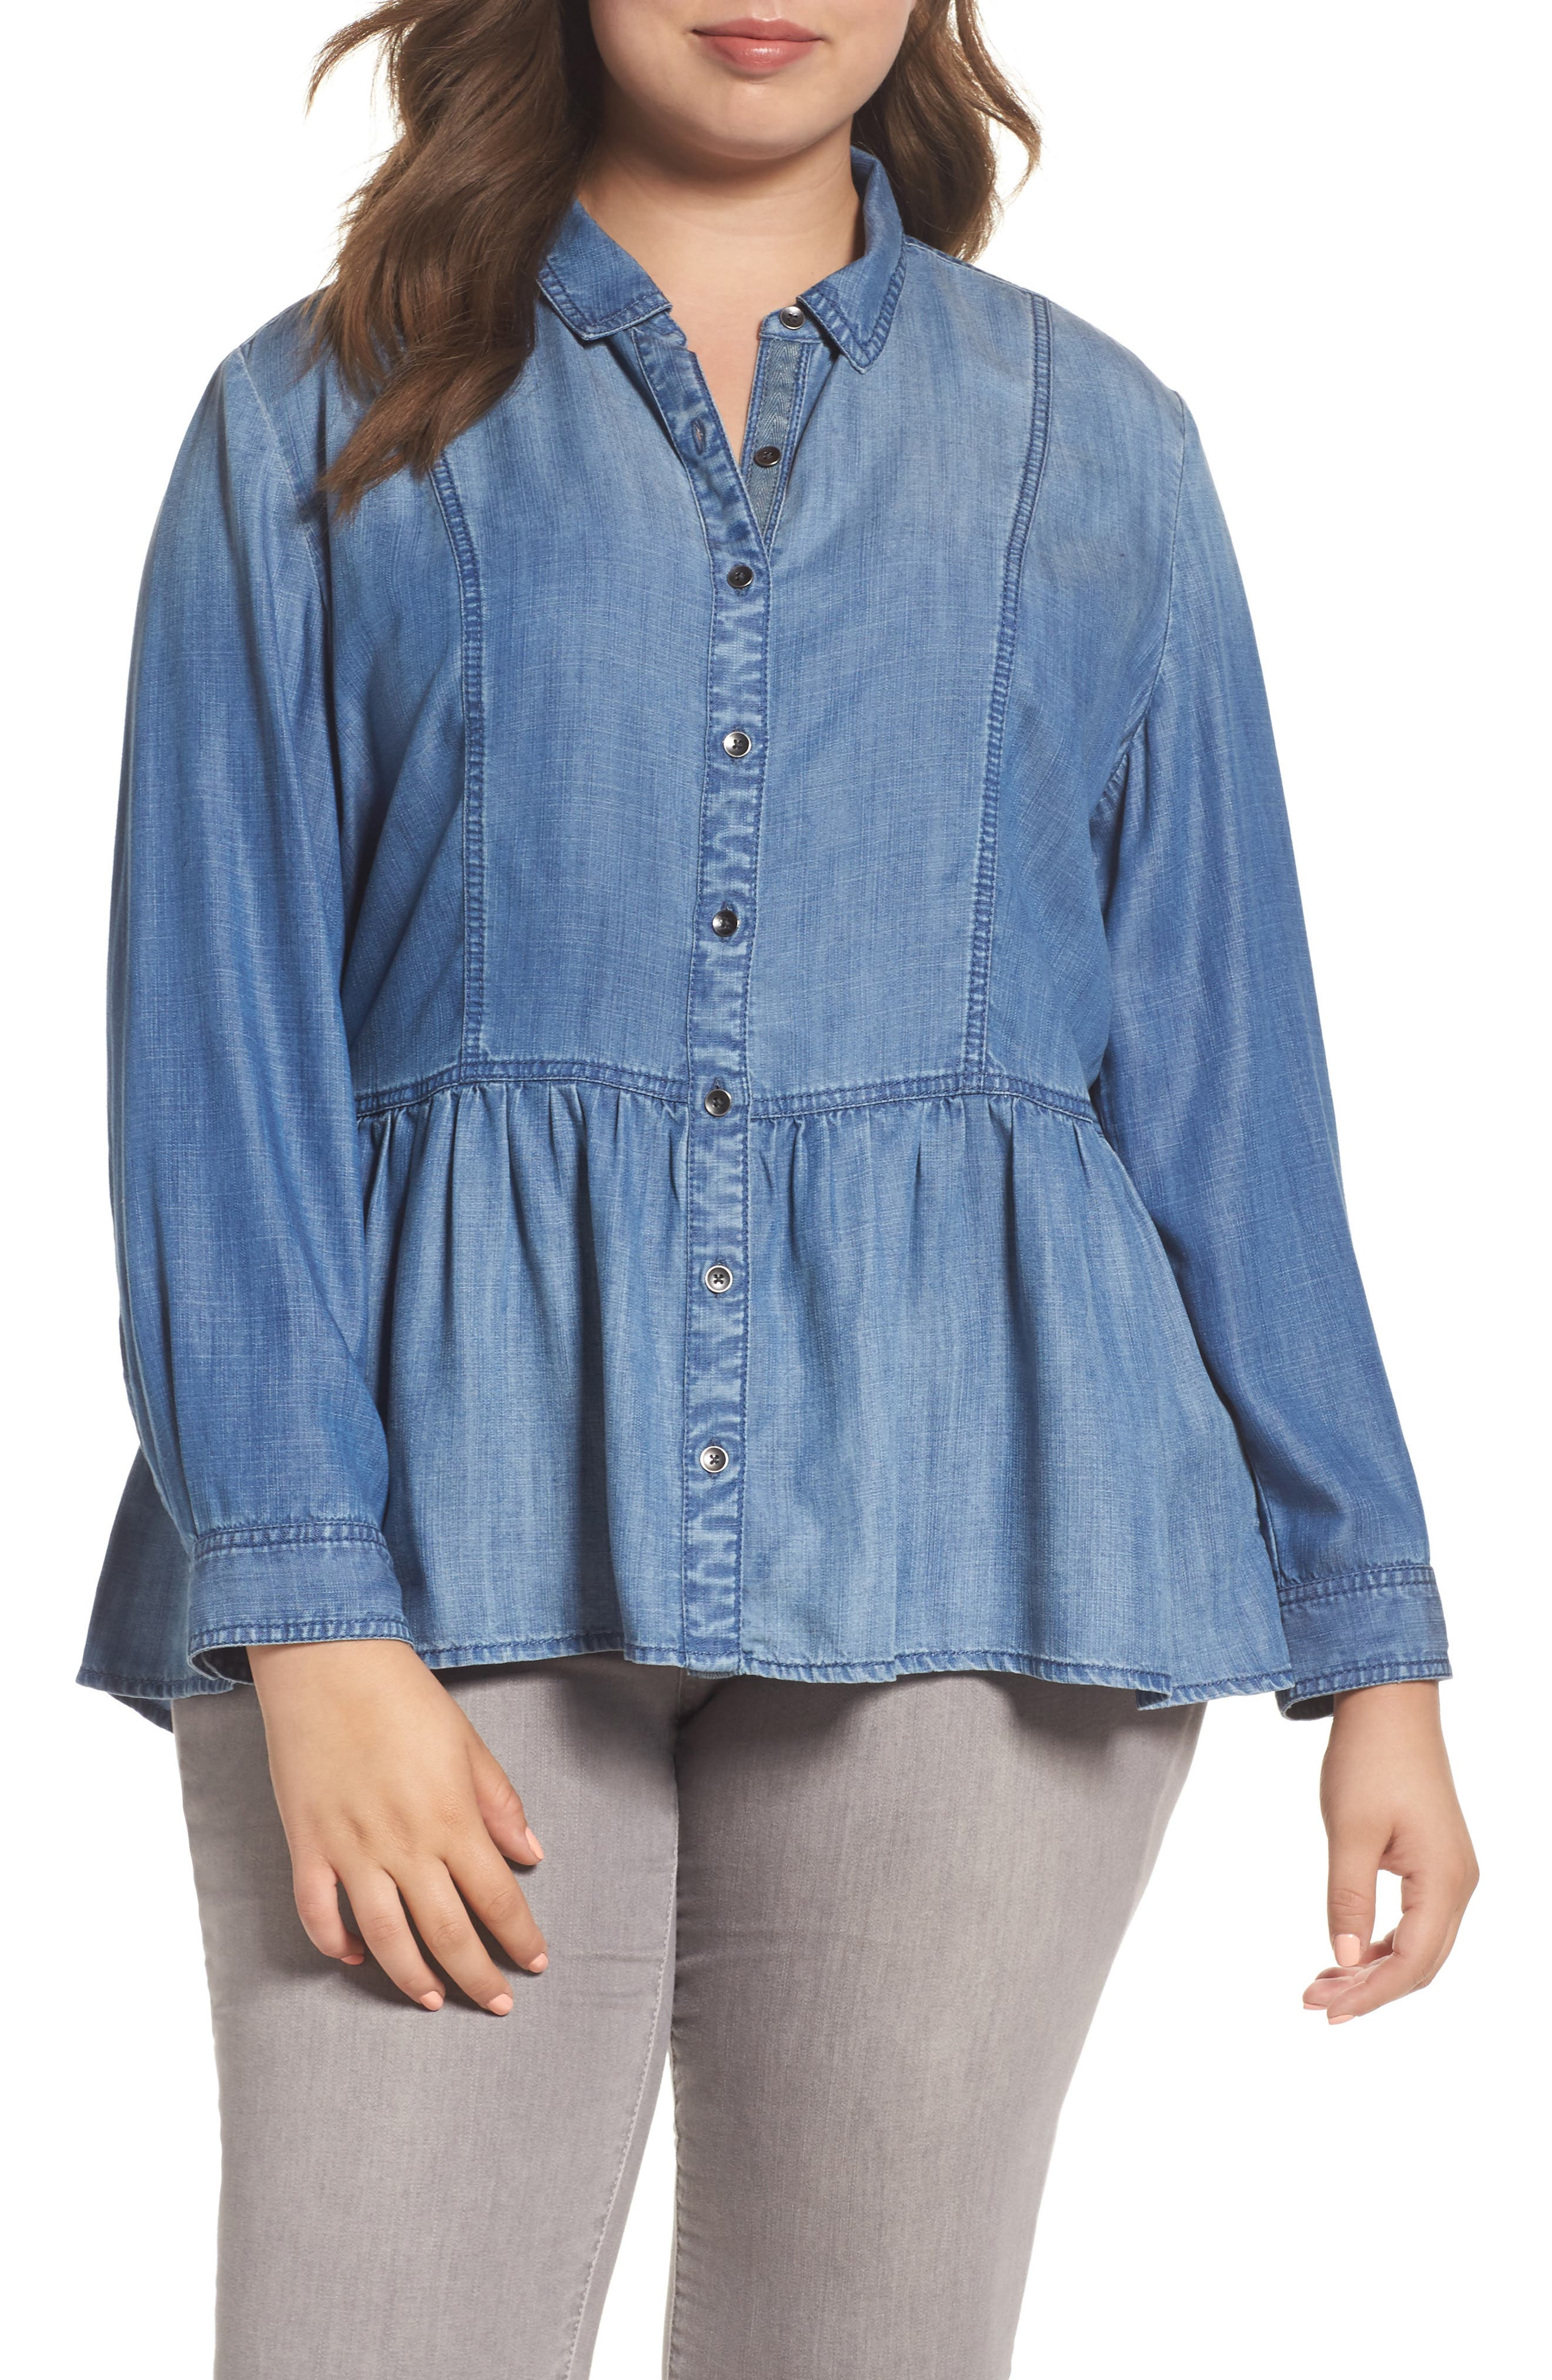 Alternate Image 1 Selected - Caslon® Peplum Denim Shirt (Plus Size)